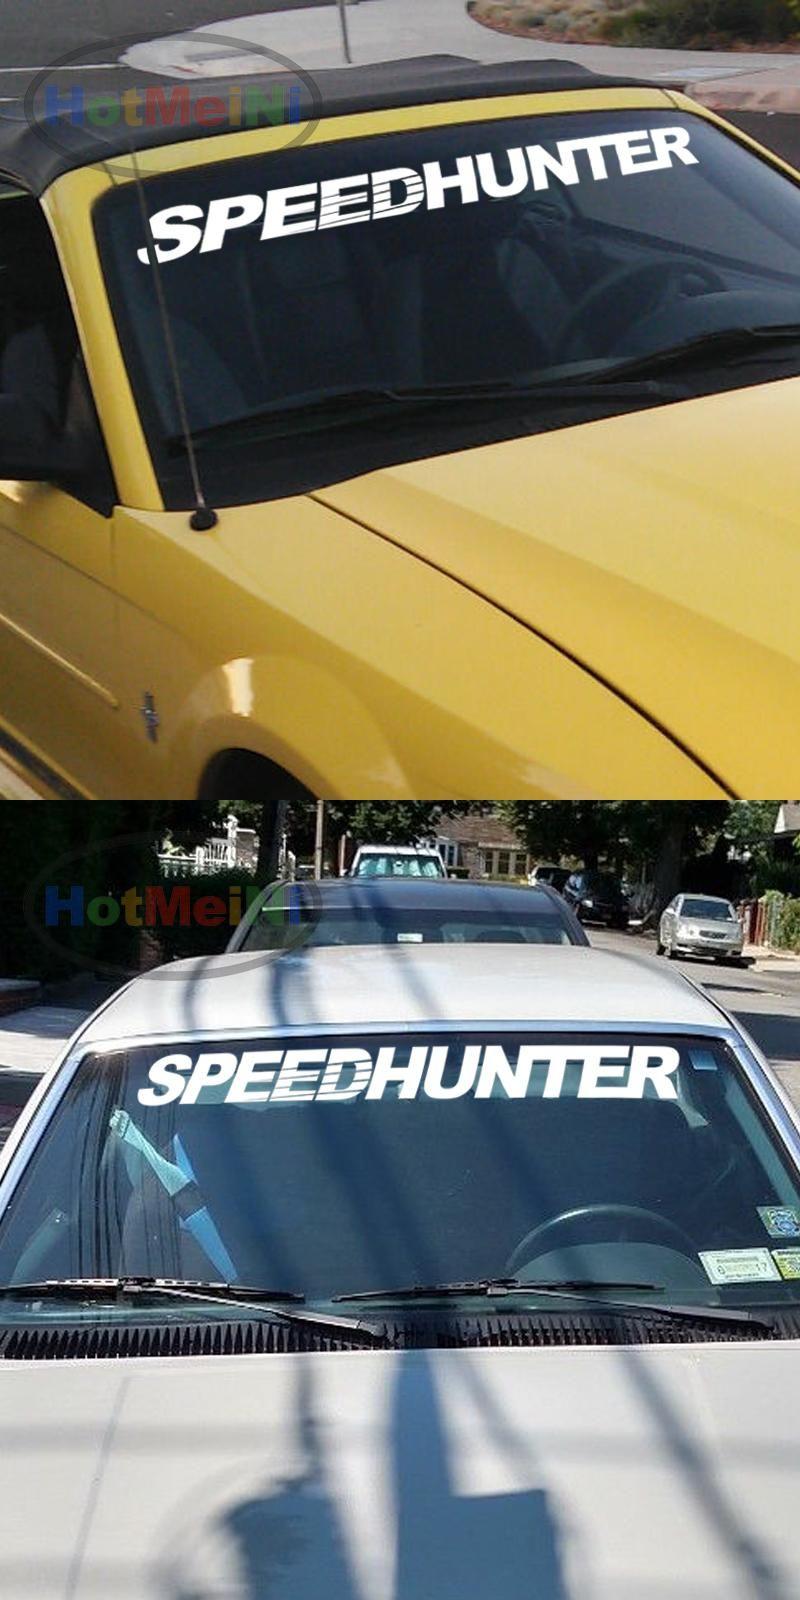 Car Styling Speedhunter Fornt Windshield Banners Decal Vinyl Car Stickers Jdm 40 Creative Sticker Black Sliver Vinyl Car Stickers Car Banner Jdm [ 1600 x 800 Pixel ]